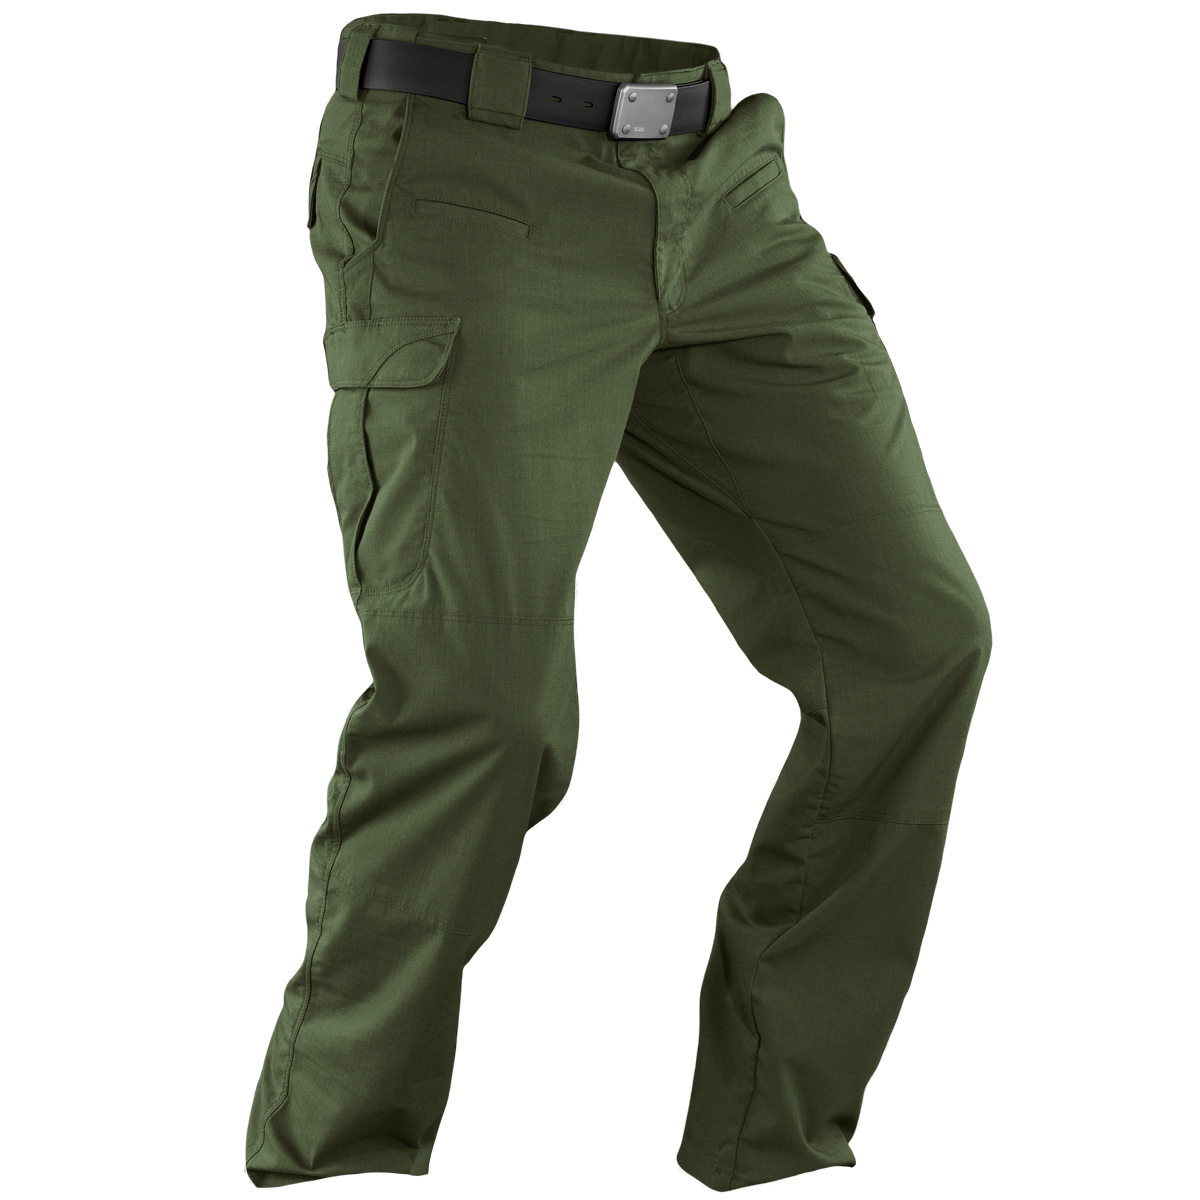 5 11 Stryke Combat Pants Tactical Patrol Cargos Mens